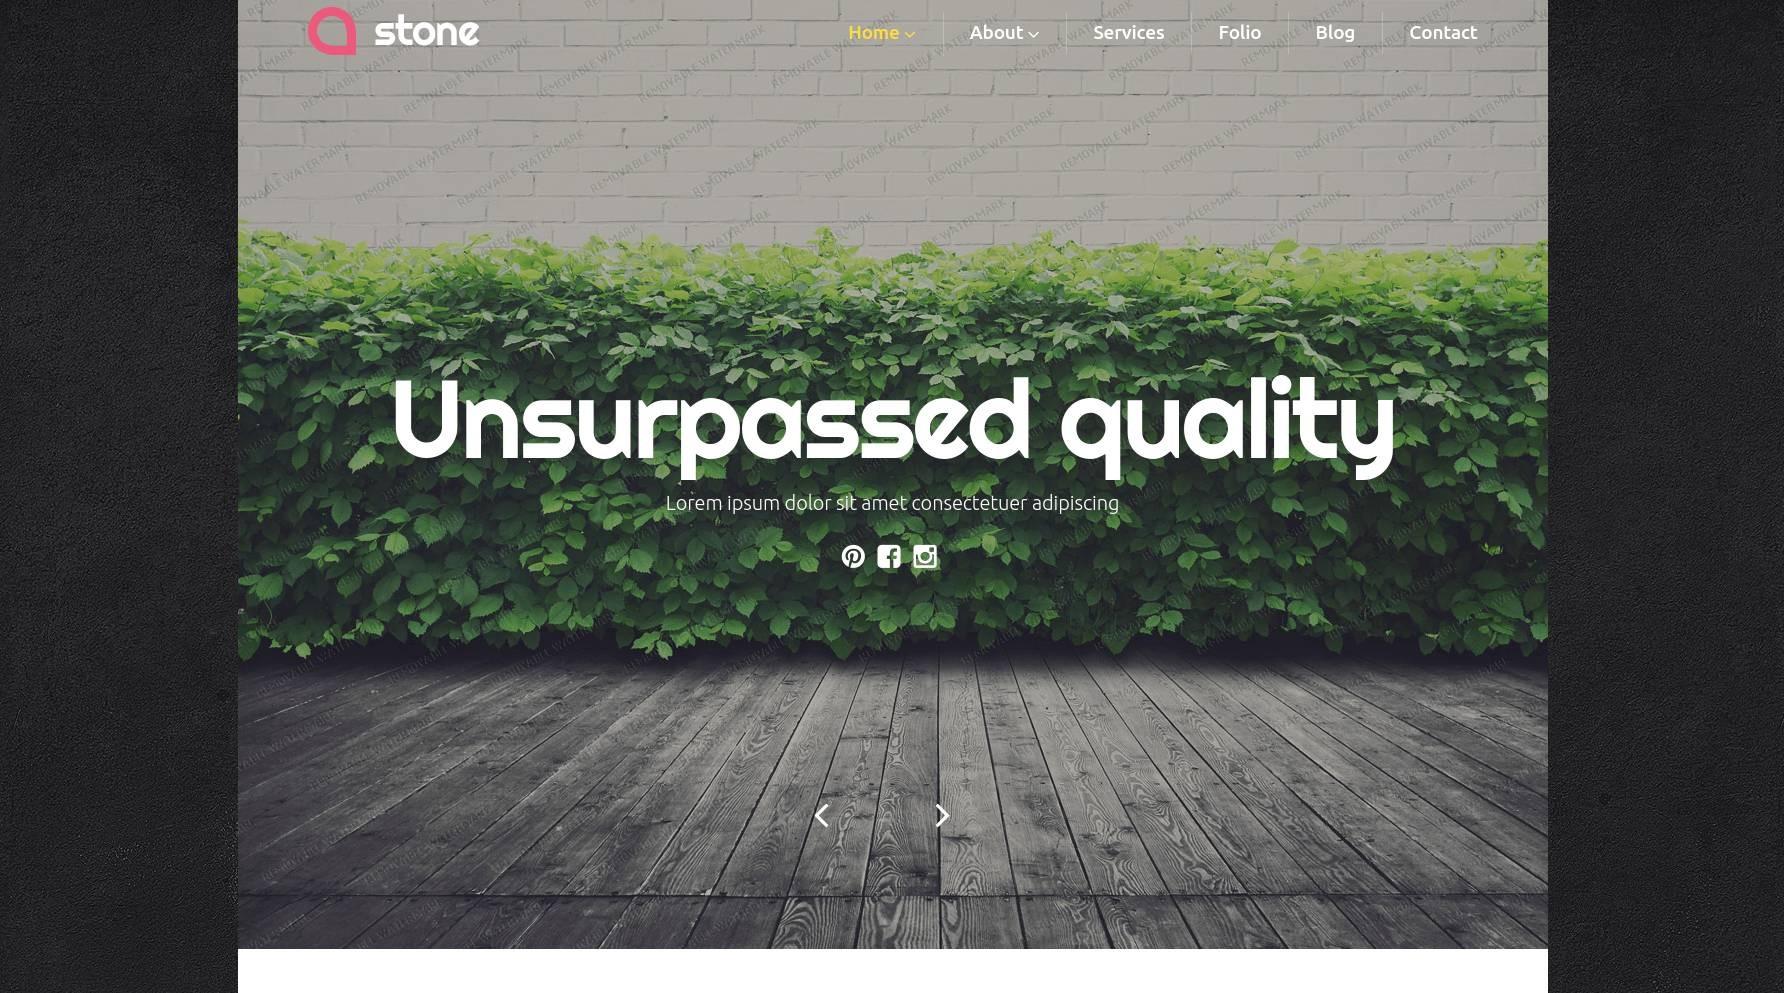 15_stone.jpg